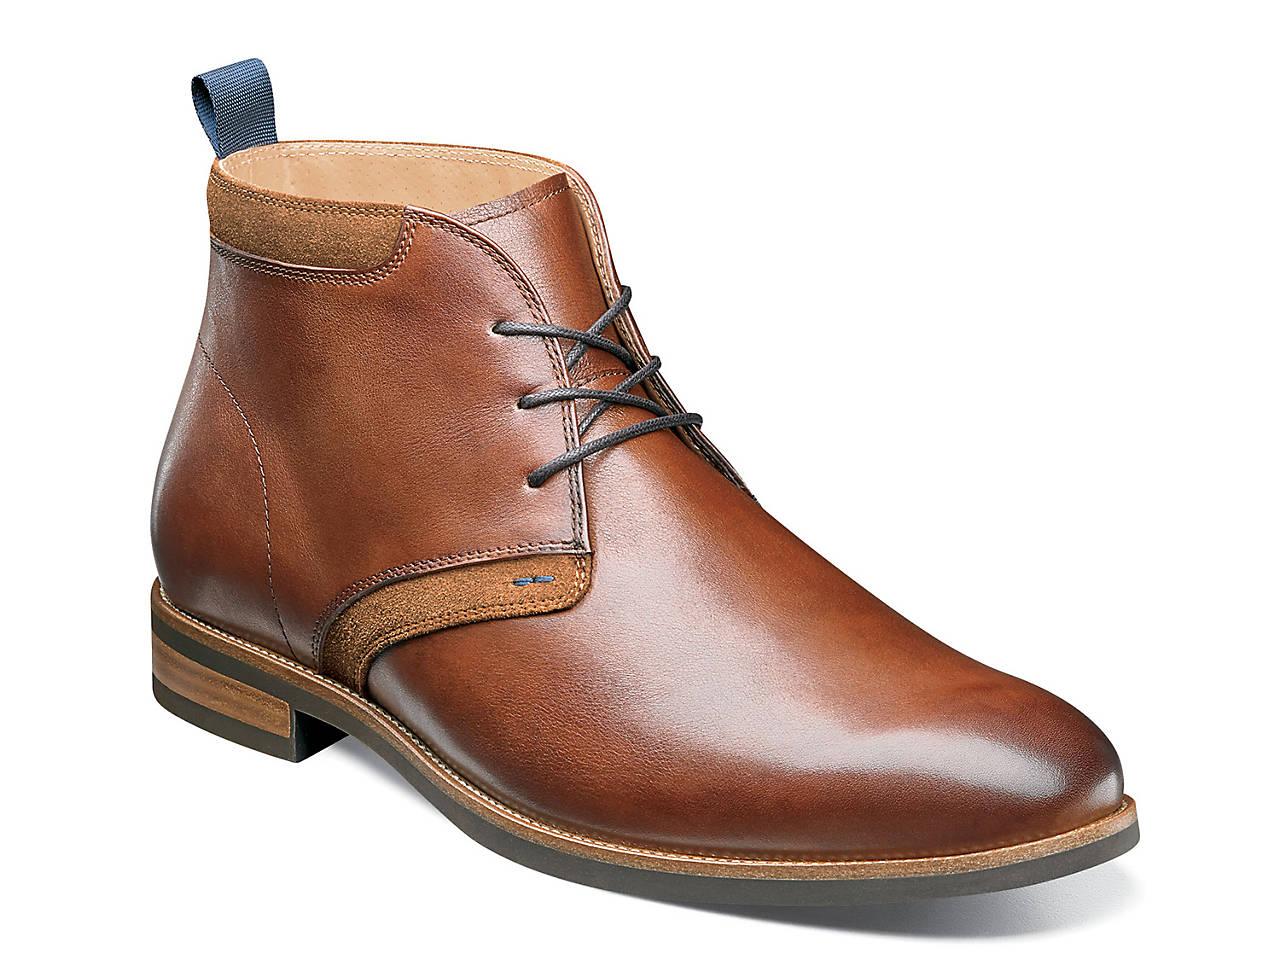 316fdcdabd0 Uptown Chukka Boot